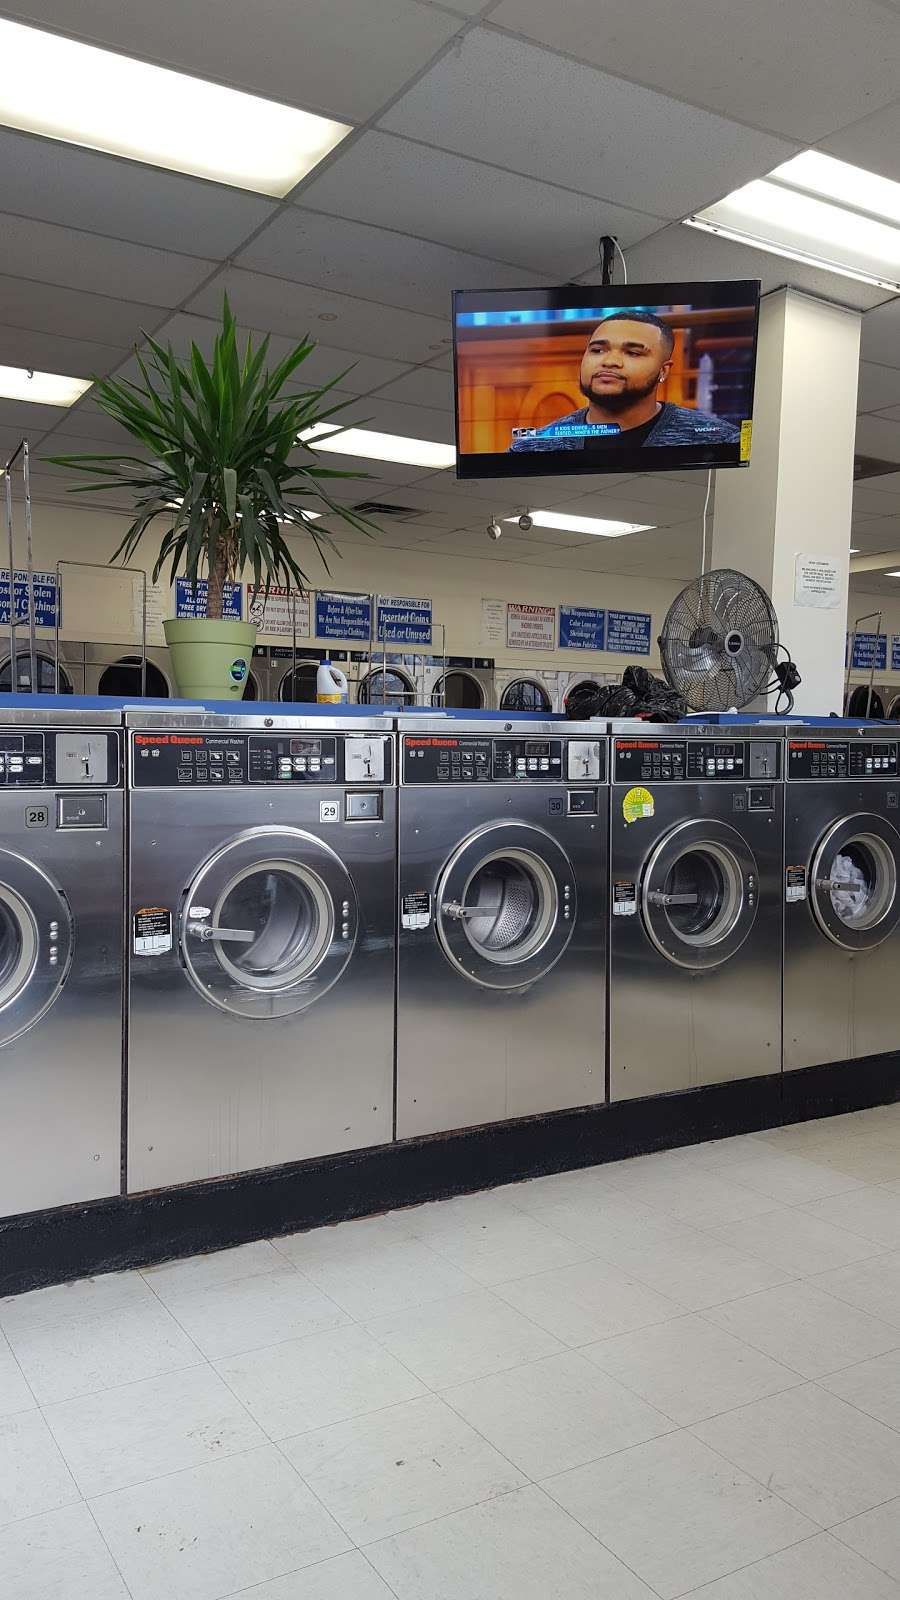 Family Wash Laundromat - laundry  | Photo 2 of 8 | Address: 6501 S Cottage Grove Ave, Chicago, IL 60637, USA